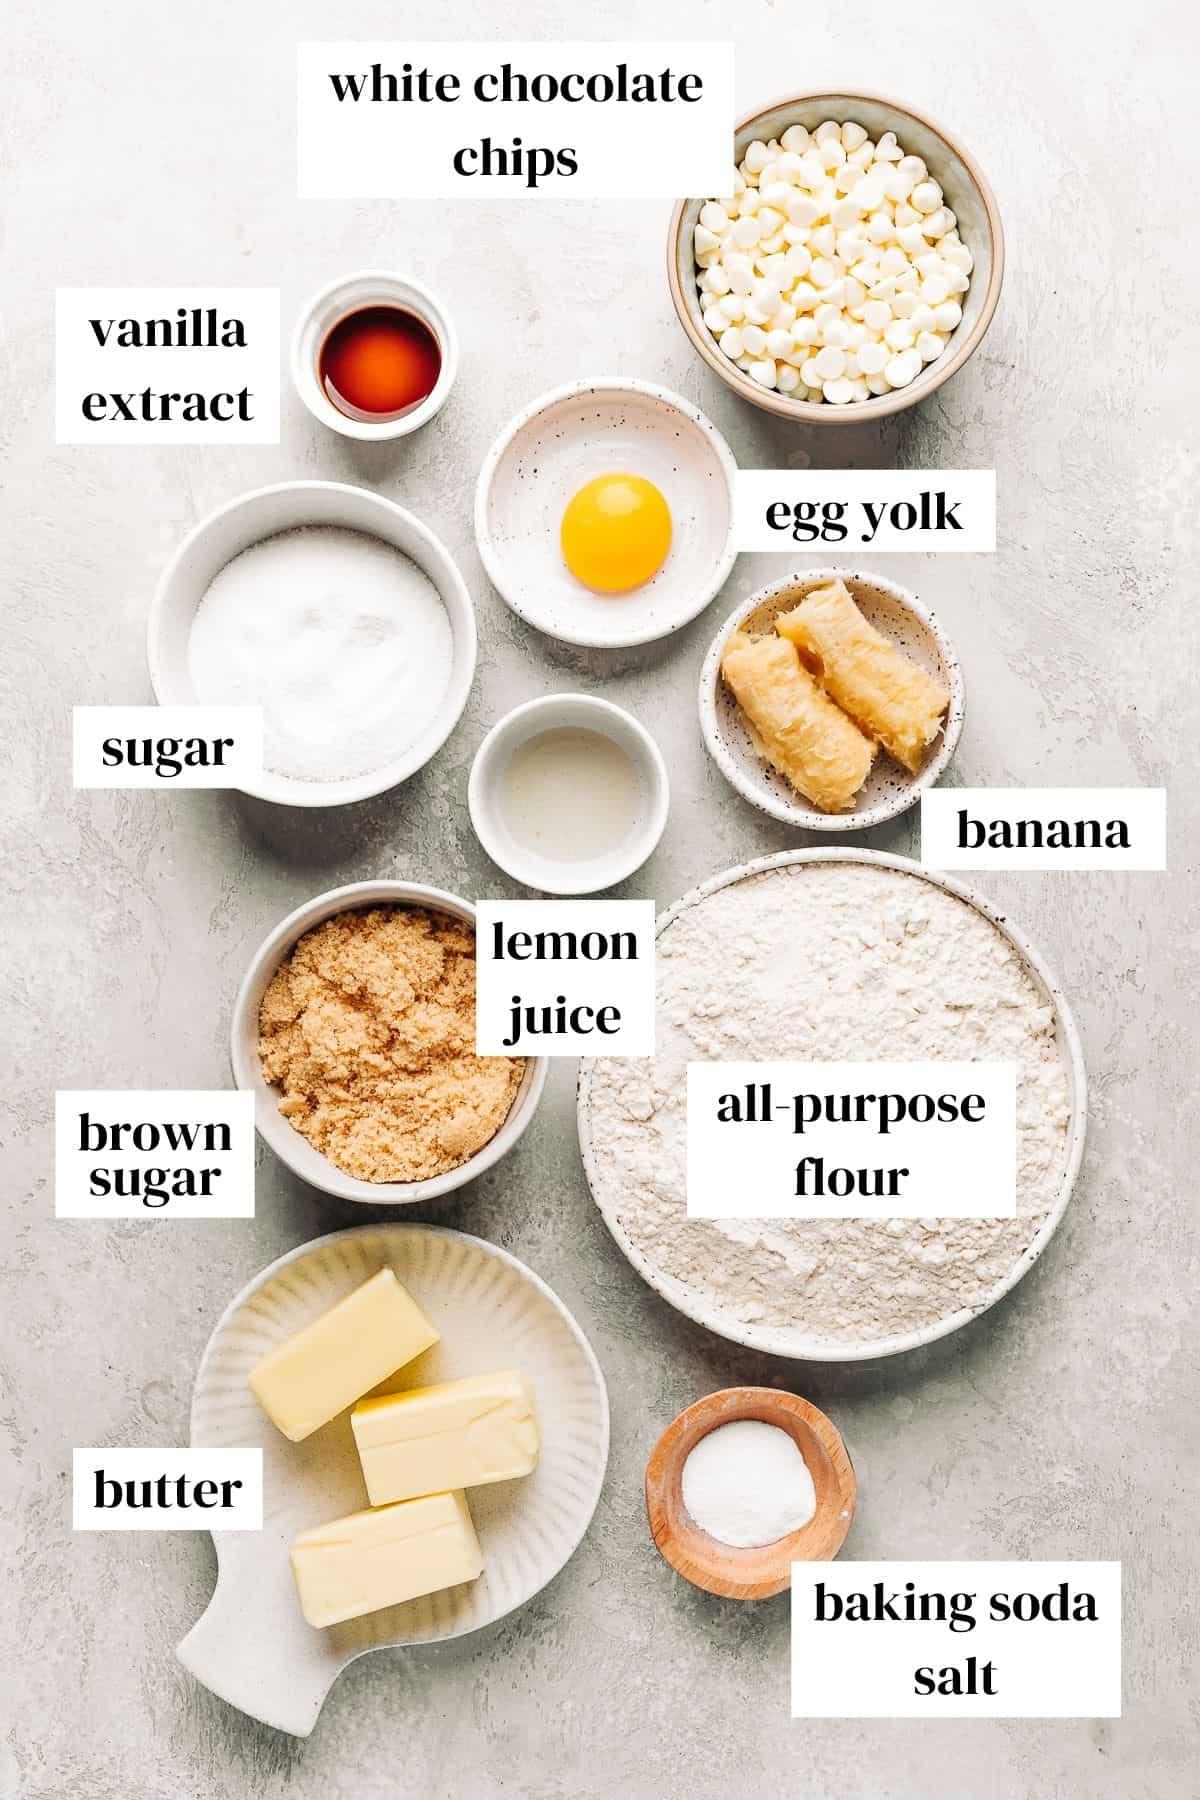 vanilla extract, white chocolate chips, egg yolk, banana, sugar, lemon juice, flour, brown sugar, butter, and salt on a grey background.